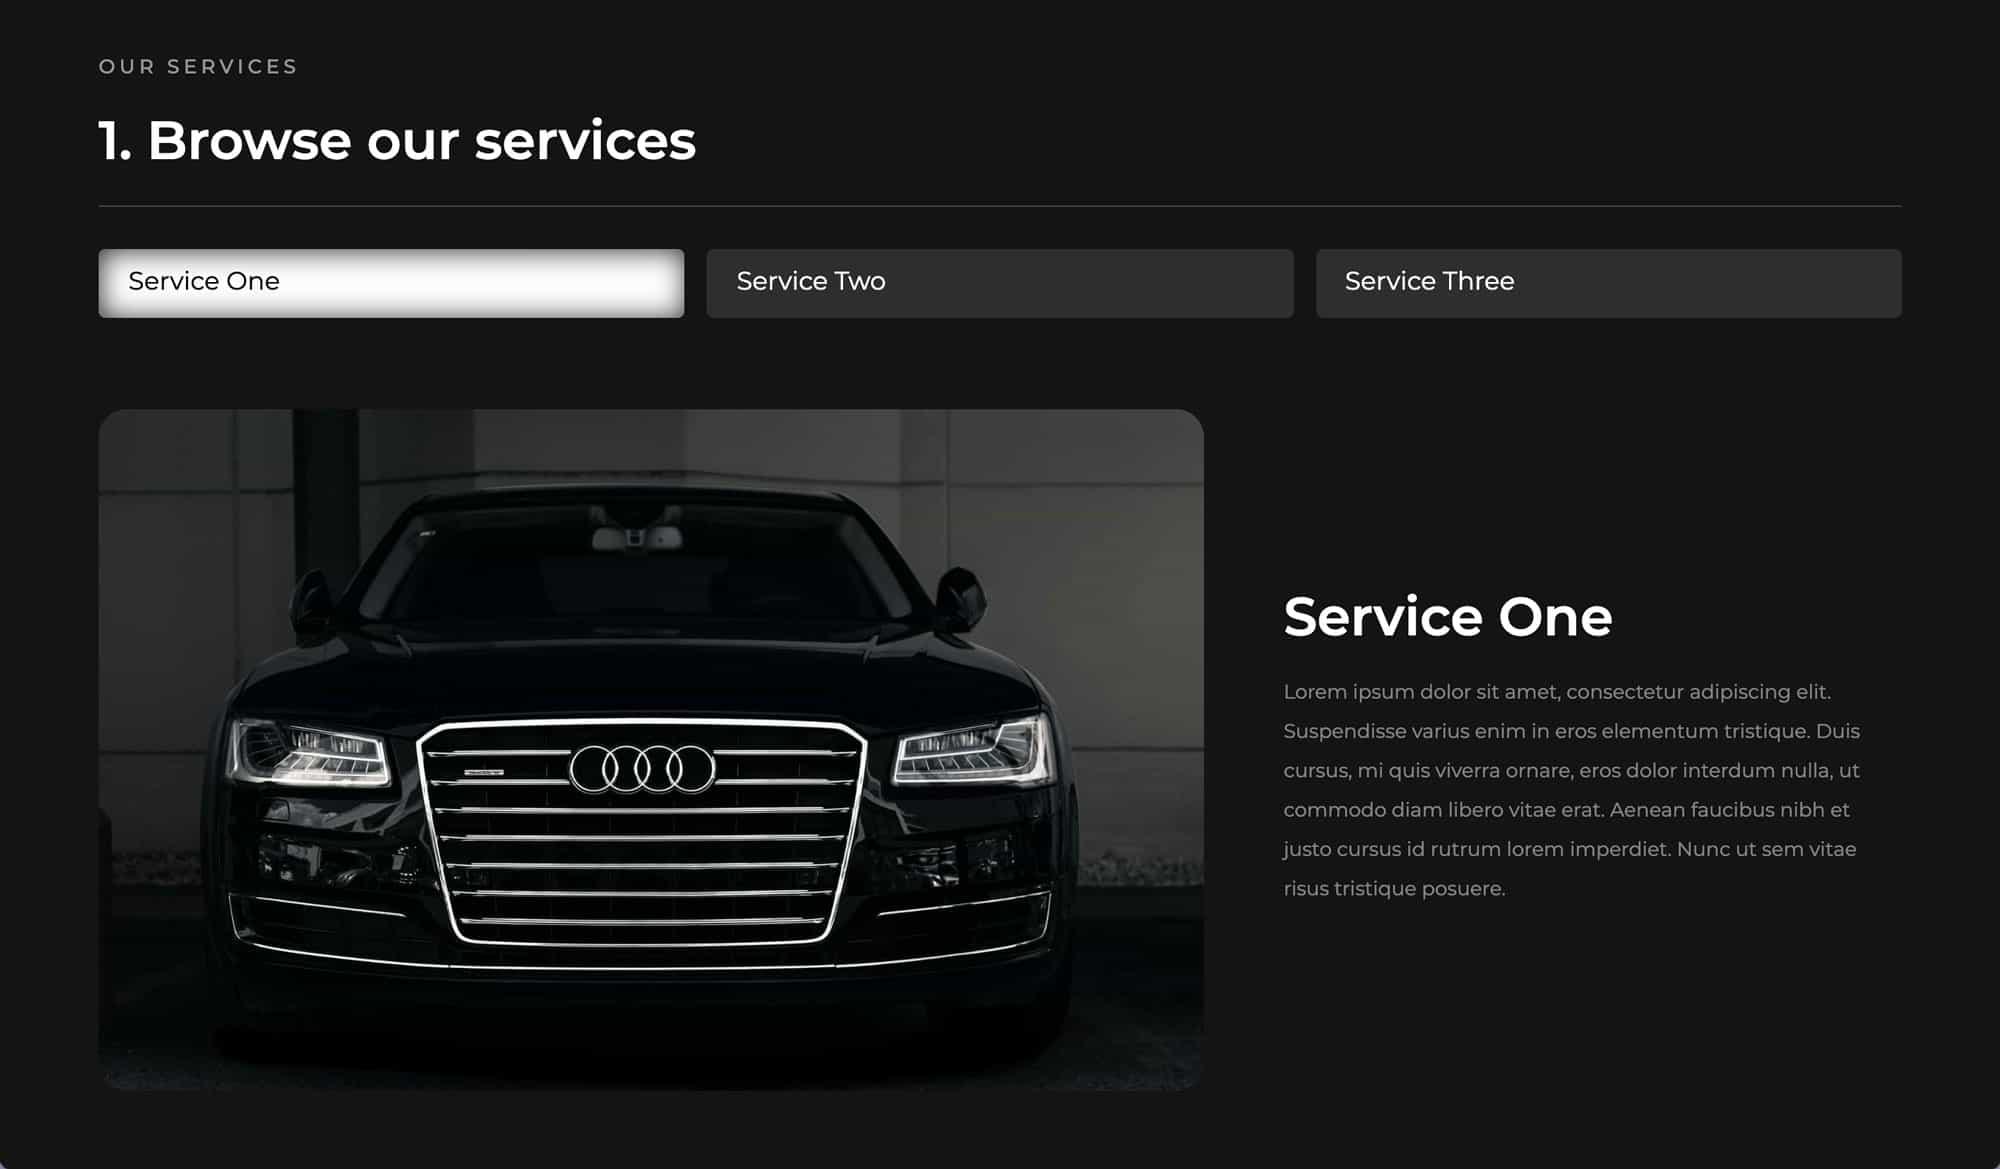 A screenshot of the services description section